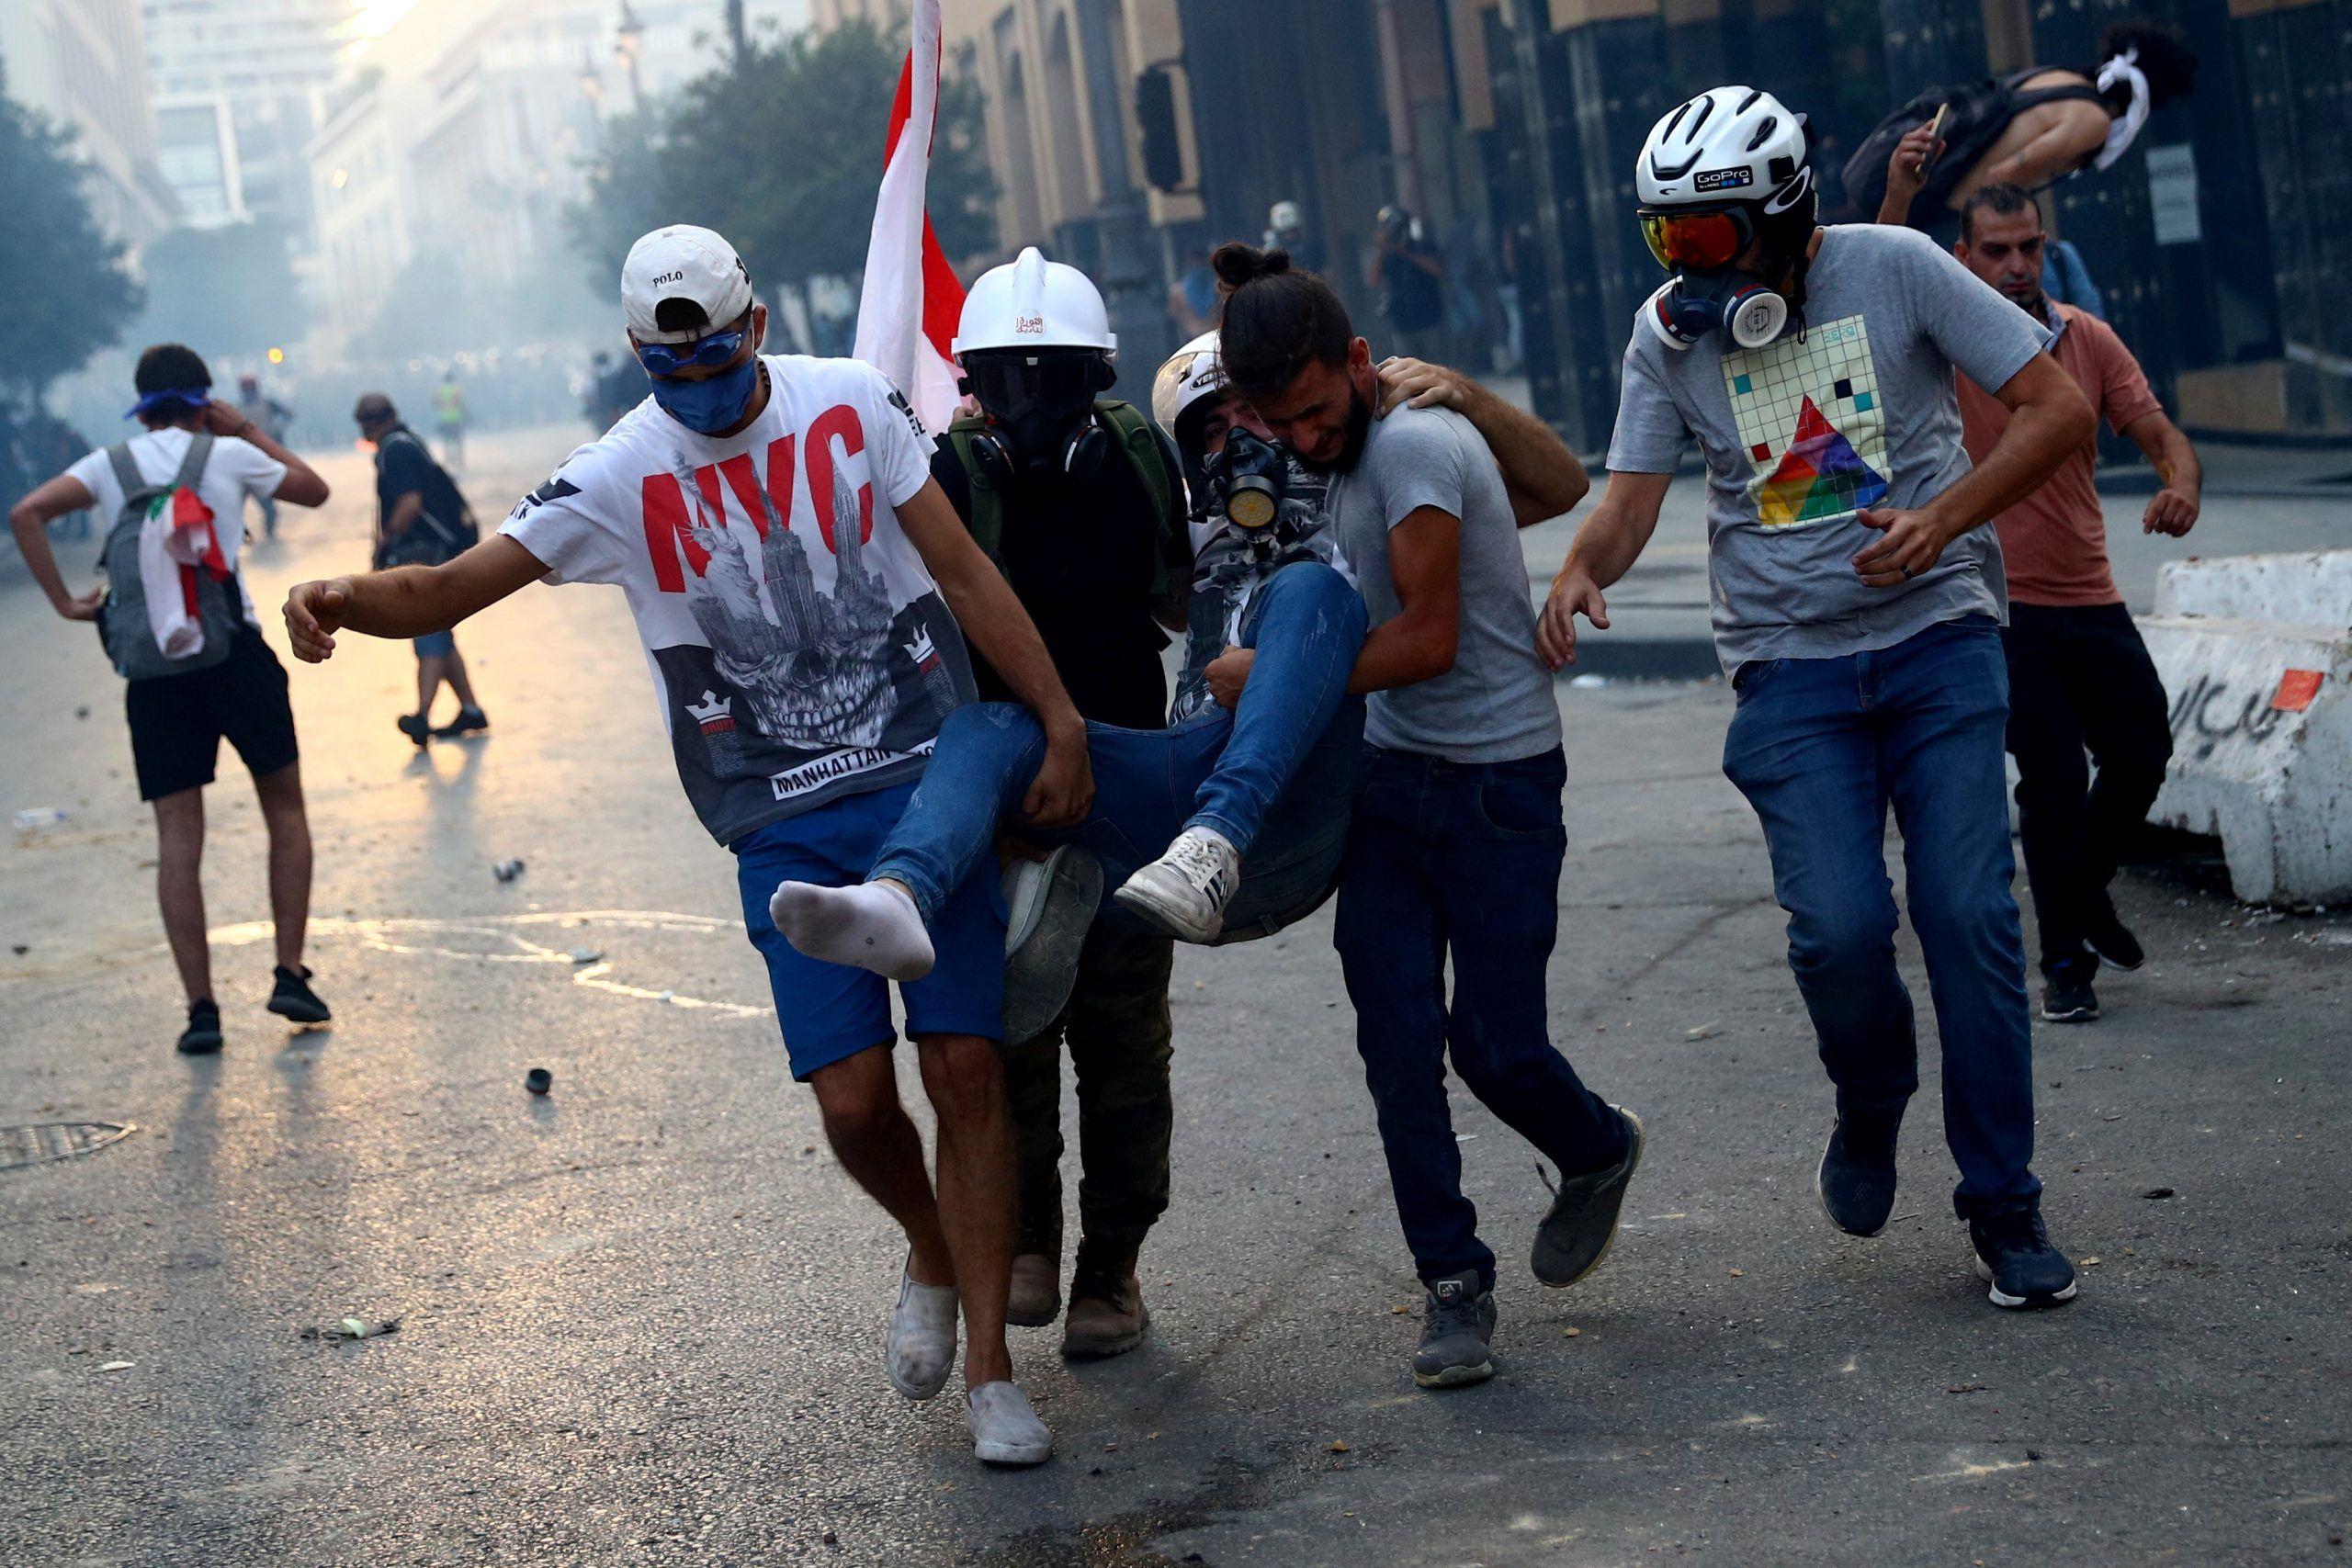 2020-08-10T172202Z_1075441757_RC24BI97F096_RTRMADP_3_LEBANON-SECURITY-BLAST-PROTESTS-scaled